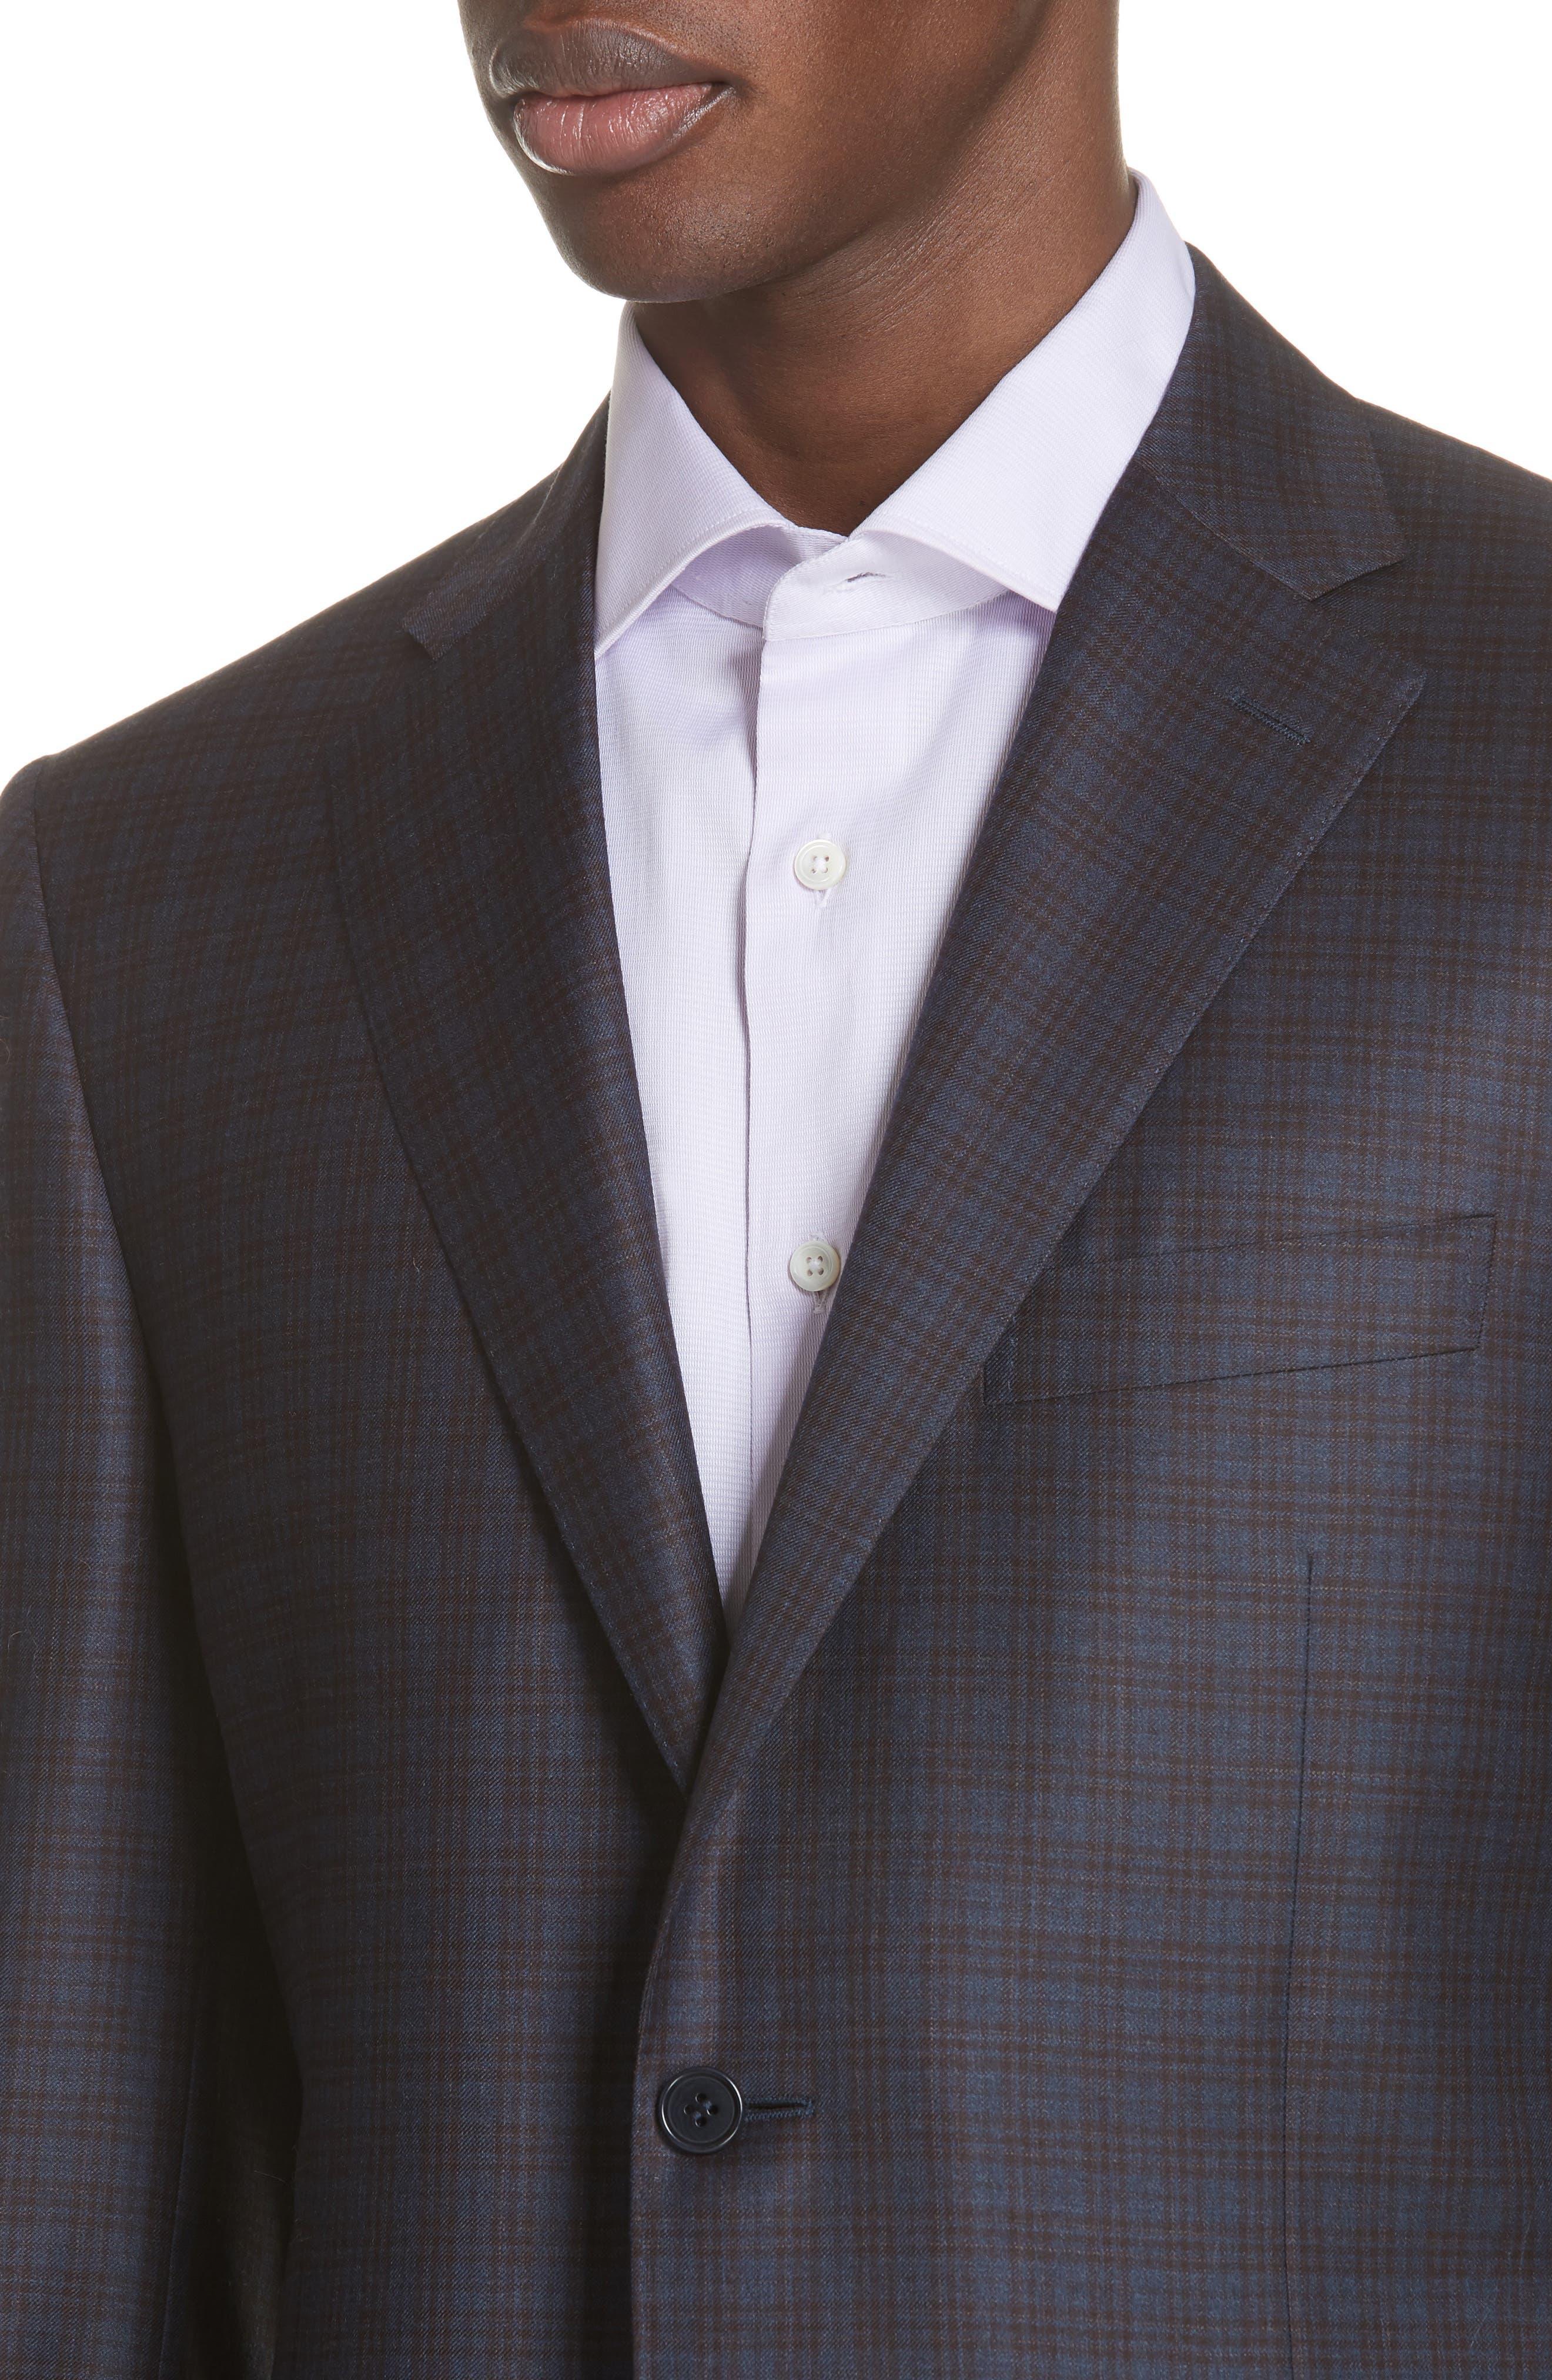 Classic Fit Plaid Wool Sport Coat,                             Alternate thumbnail 4, color,                             Dark Blue